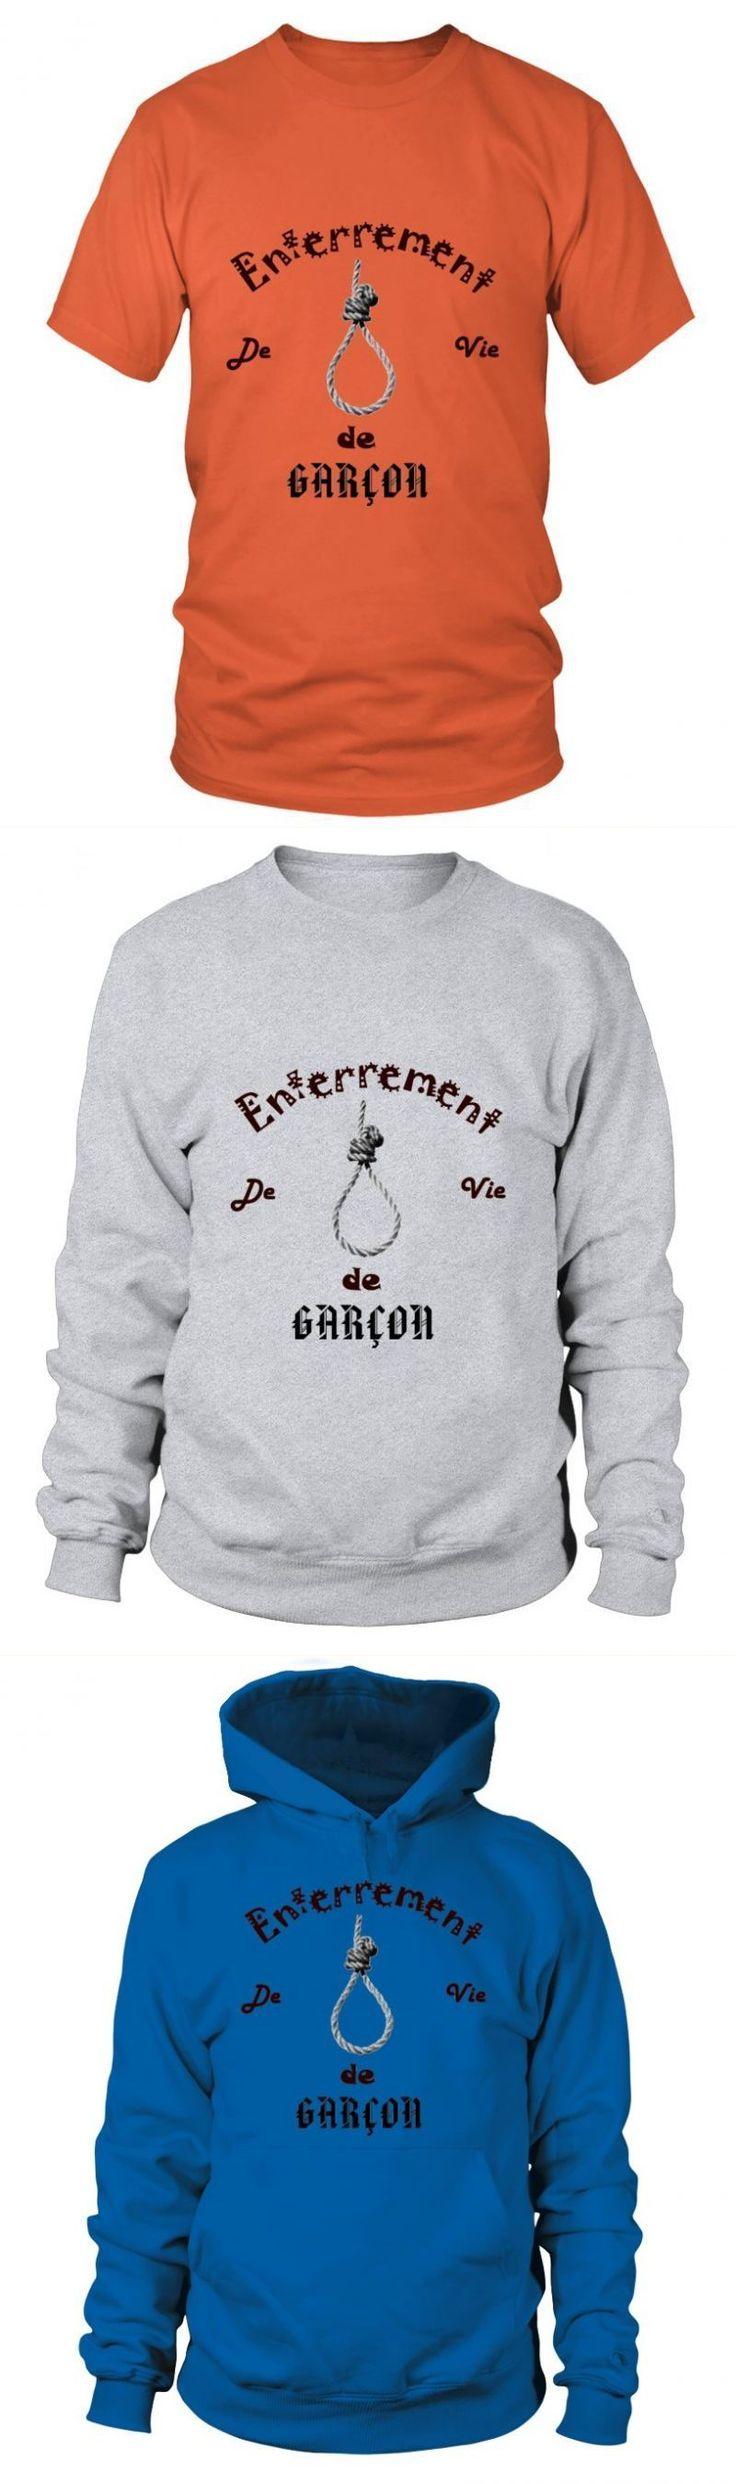 Wedding t-shirt design evg - bachelor party boy royal wedding t shirt ebay